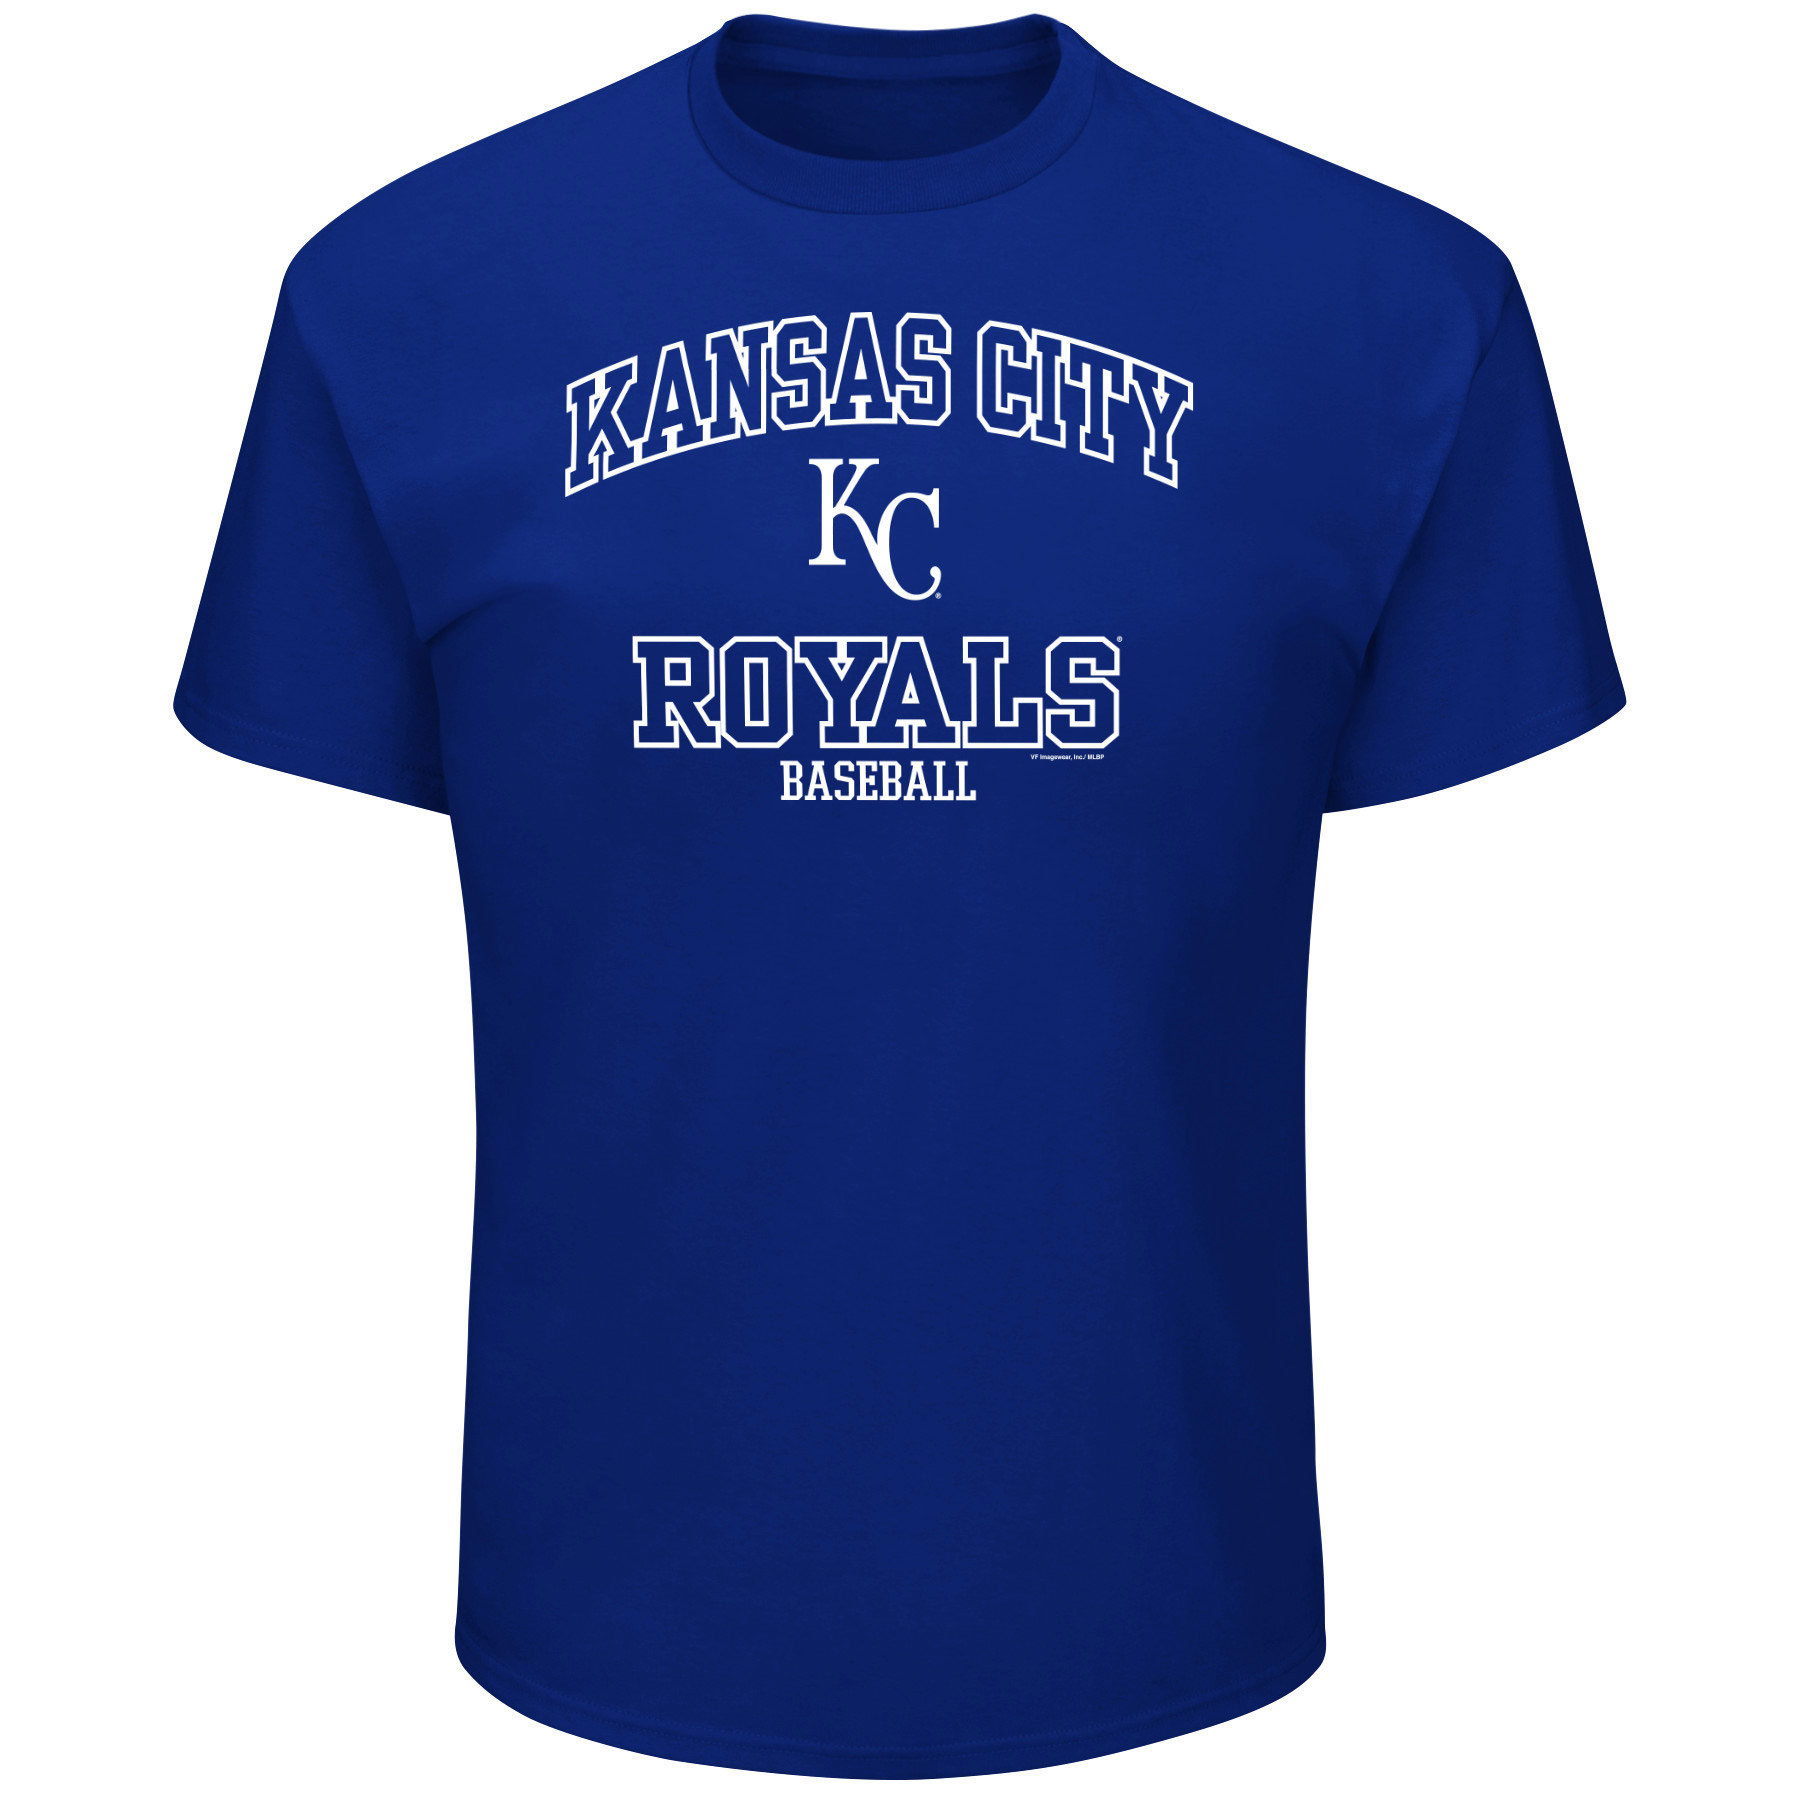 Men's Majestic Royal Kansas City Royals High Praise Team T-Shirt